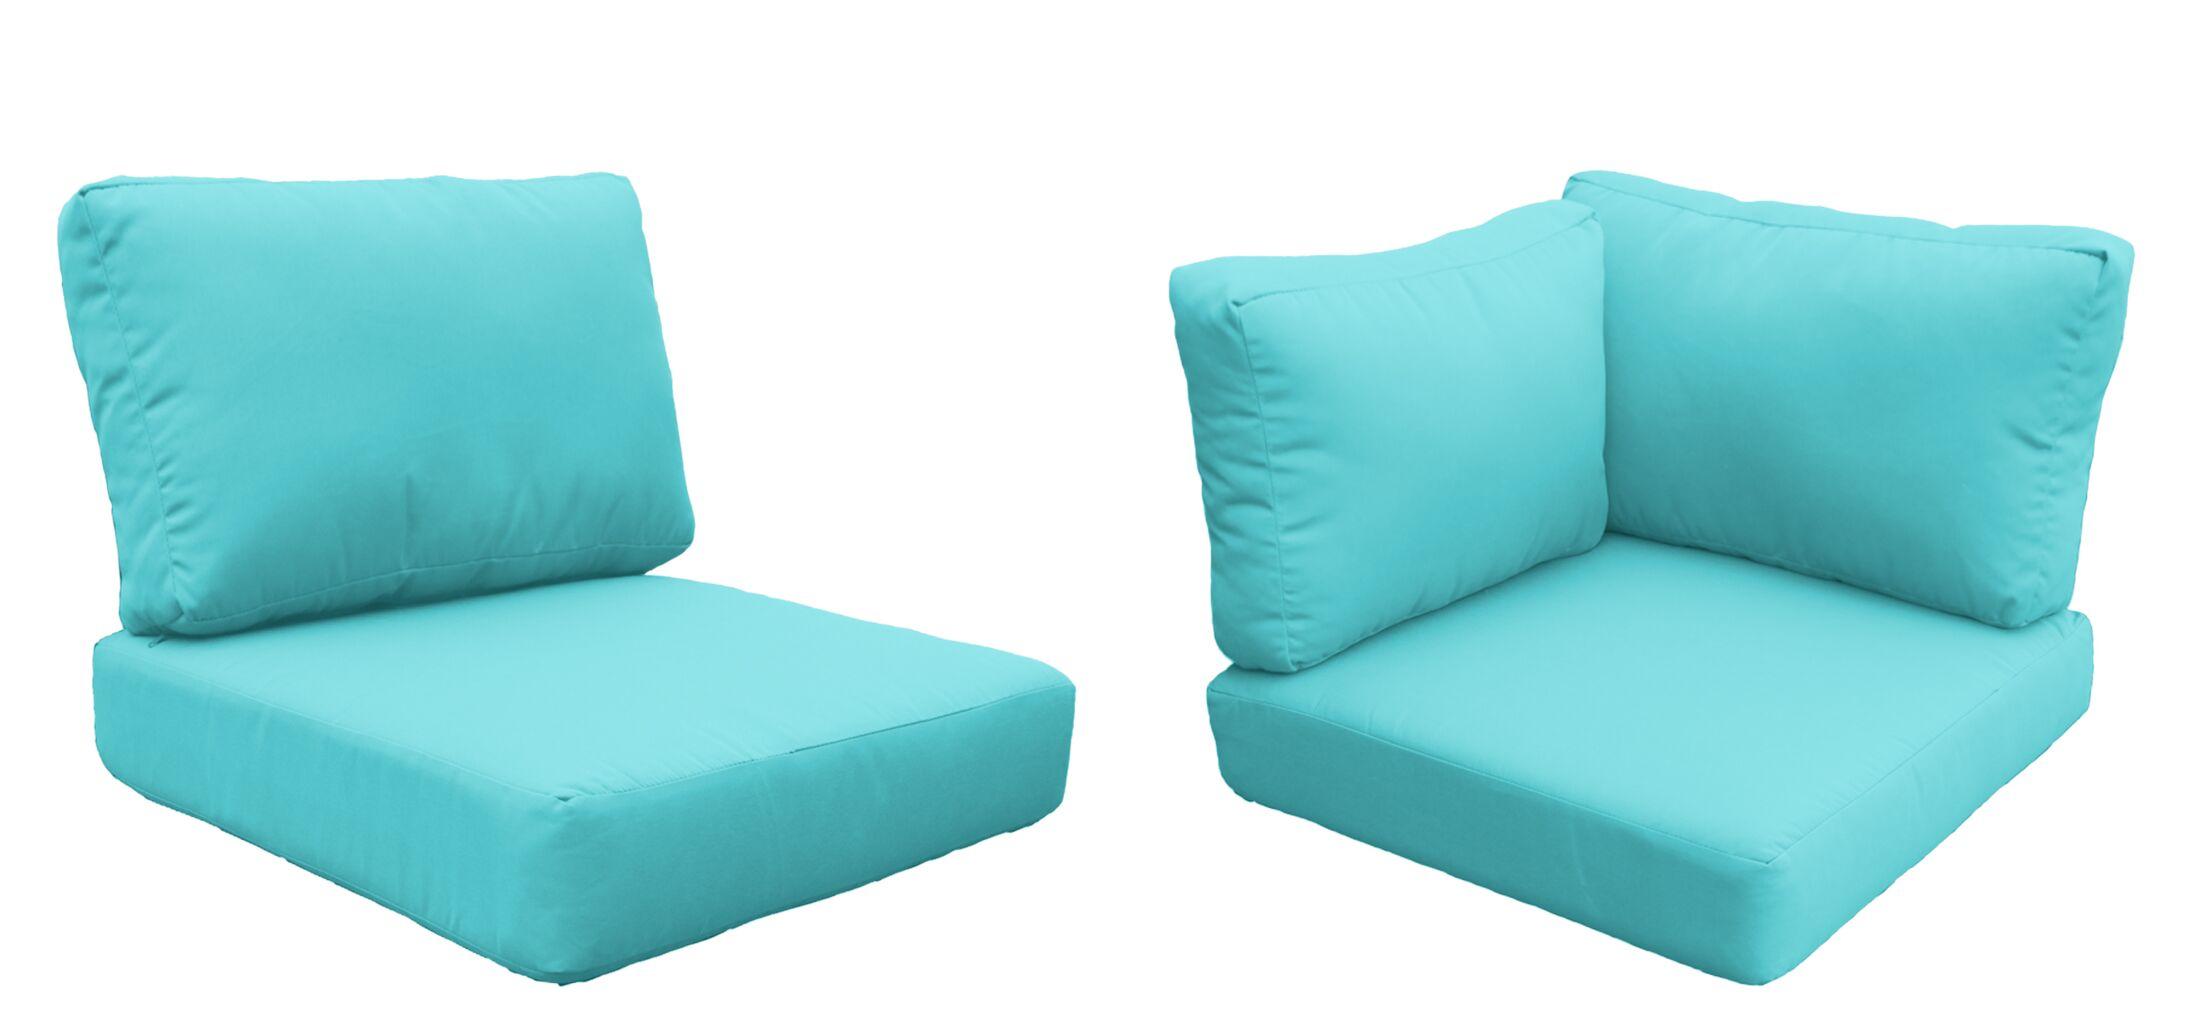 Fairmont 15 Piece Outdoor�Lounge Chair Cushion Set Fabric: Aruba